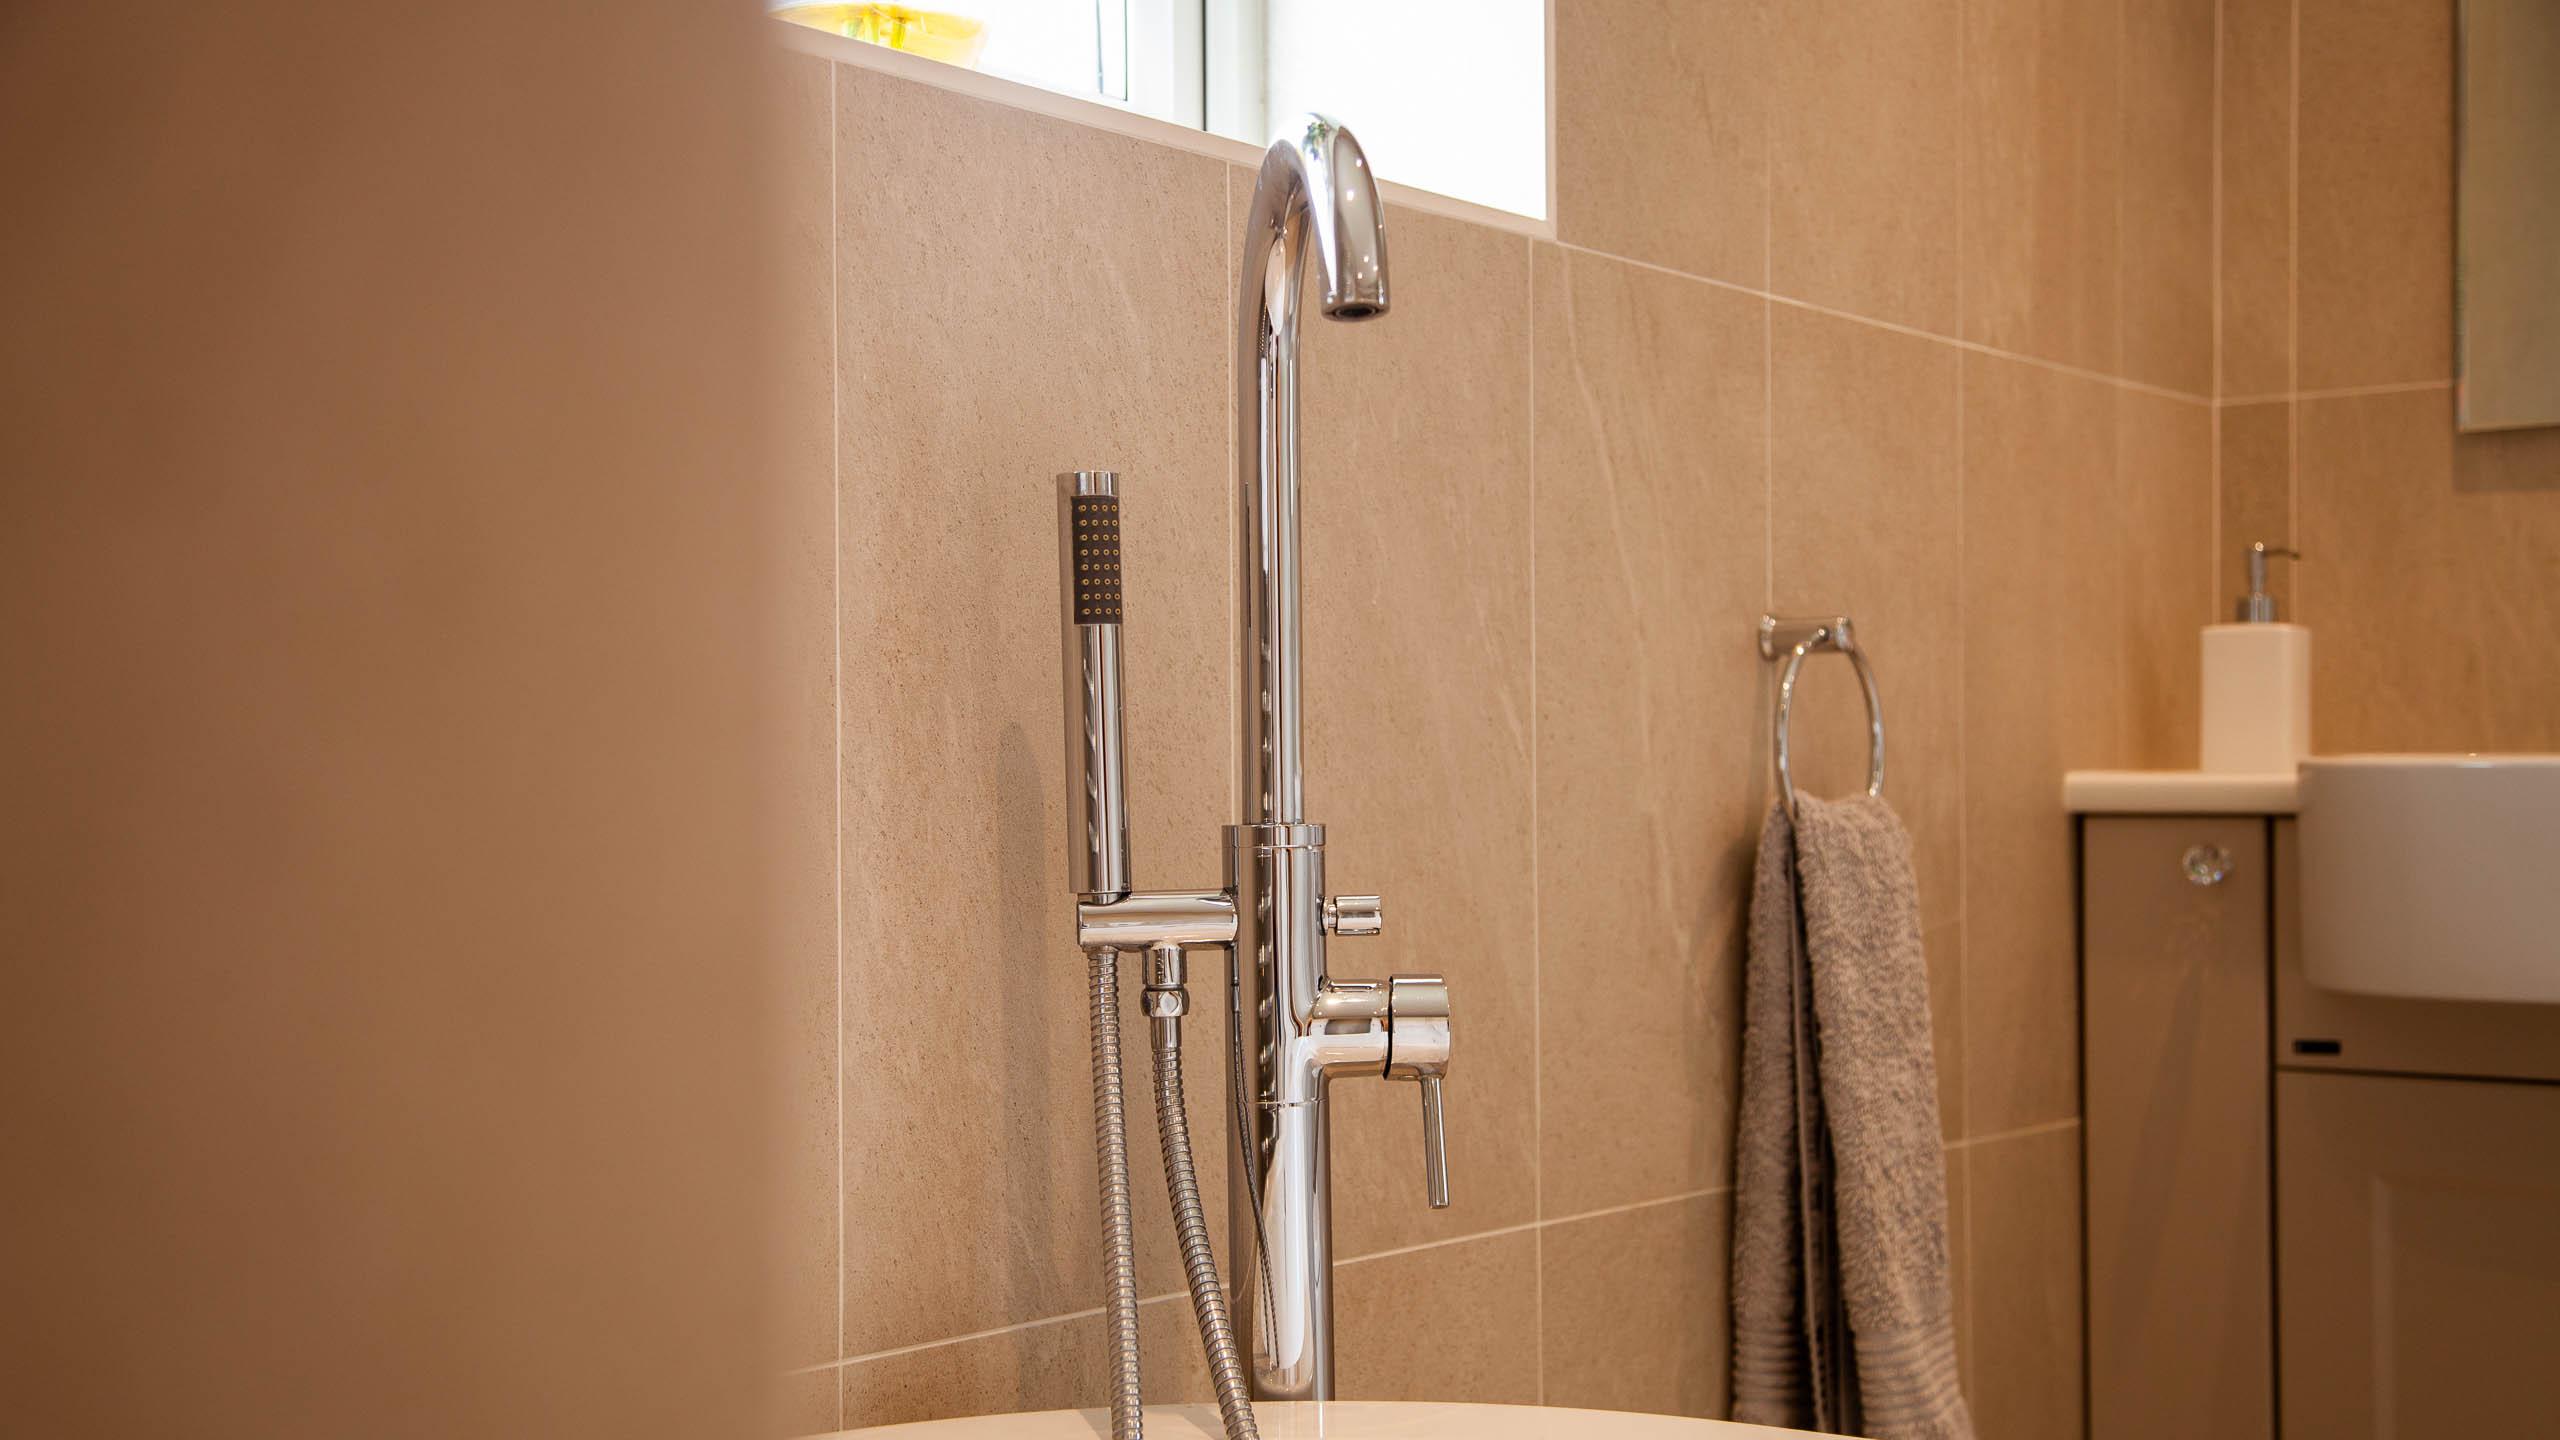 modern bathroom bath tap - bathroom installation by RJ Steele builders in Sussex